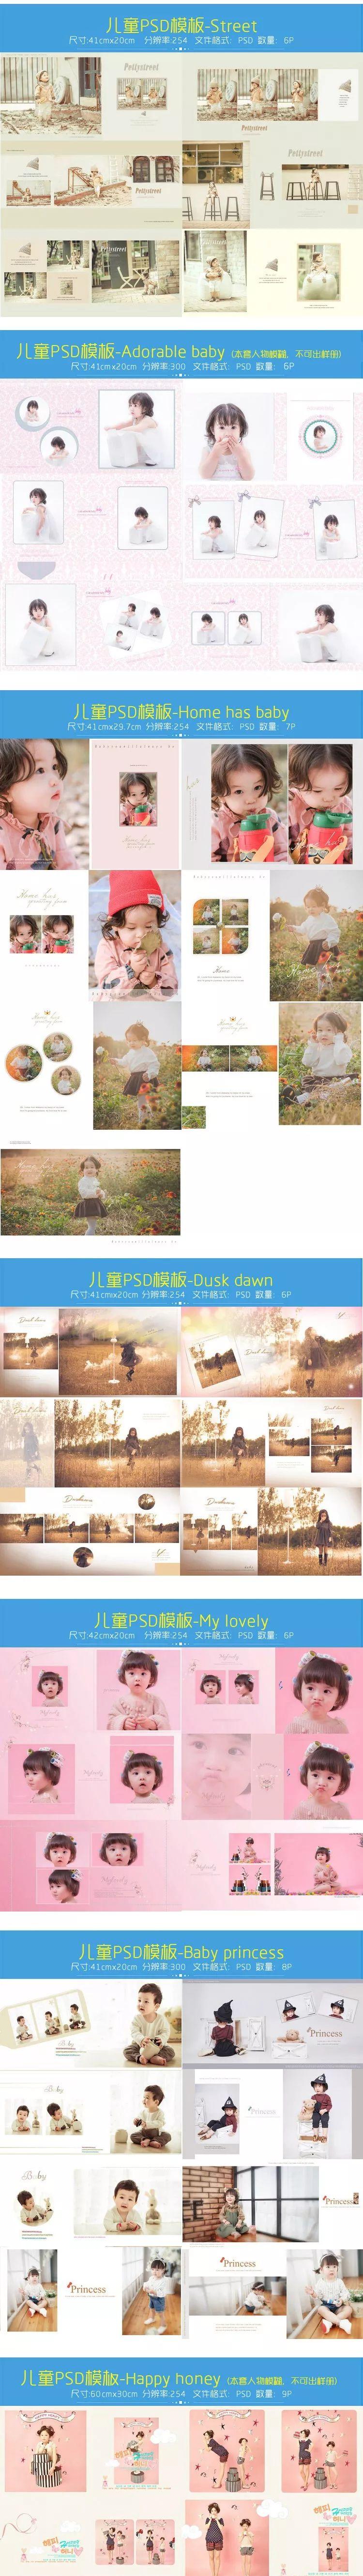 【PSD素材下载】儿童宝宝影楼摄影写真模板相册 纪念宝贝成长样片素材